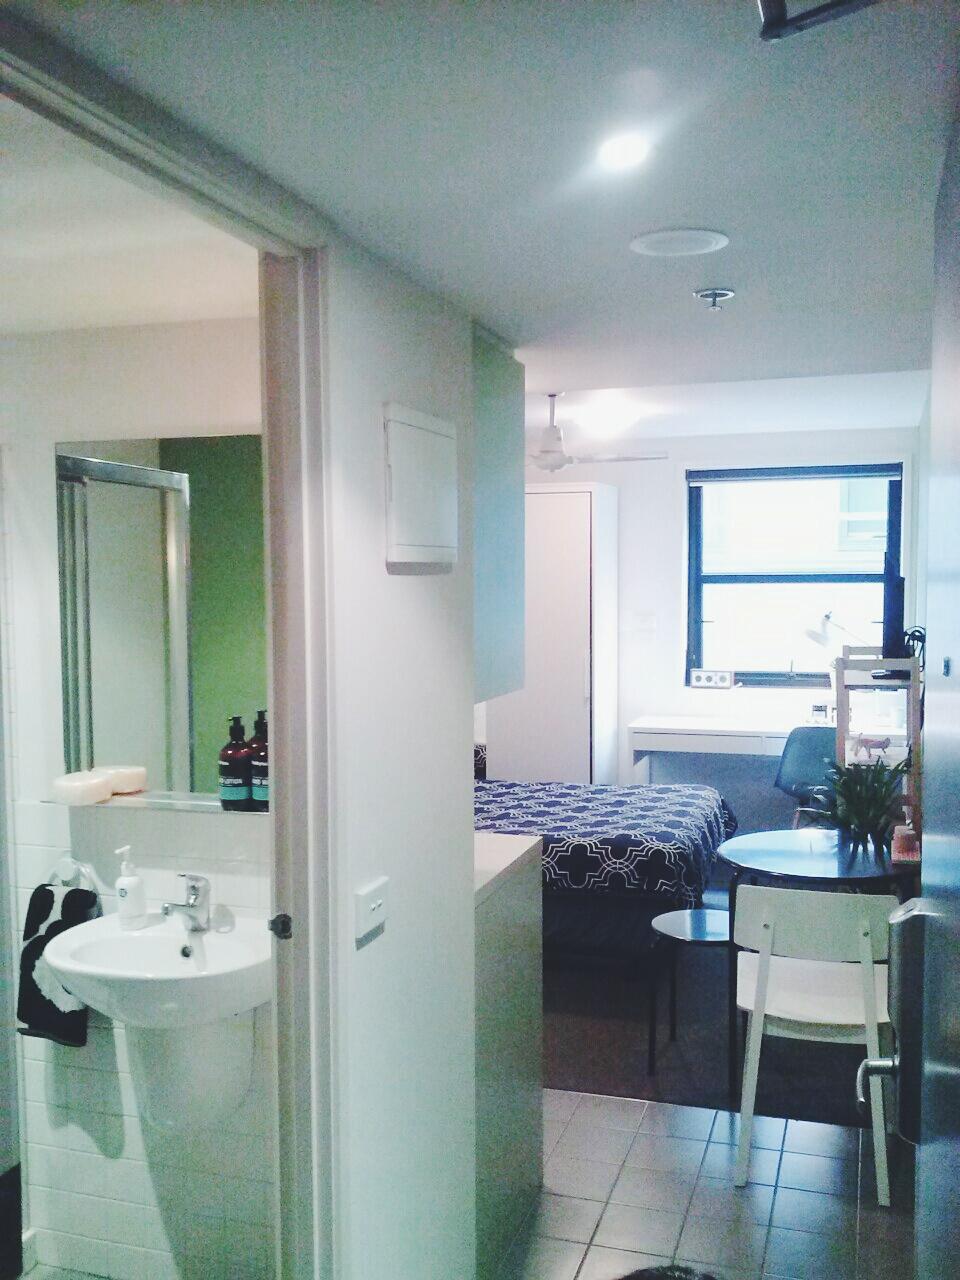 Studio unit interior design ideas latest room dividers with shelves improving open interior - Studio unit interior design ideas ...